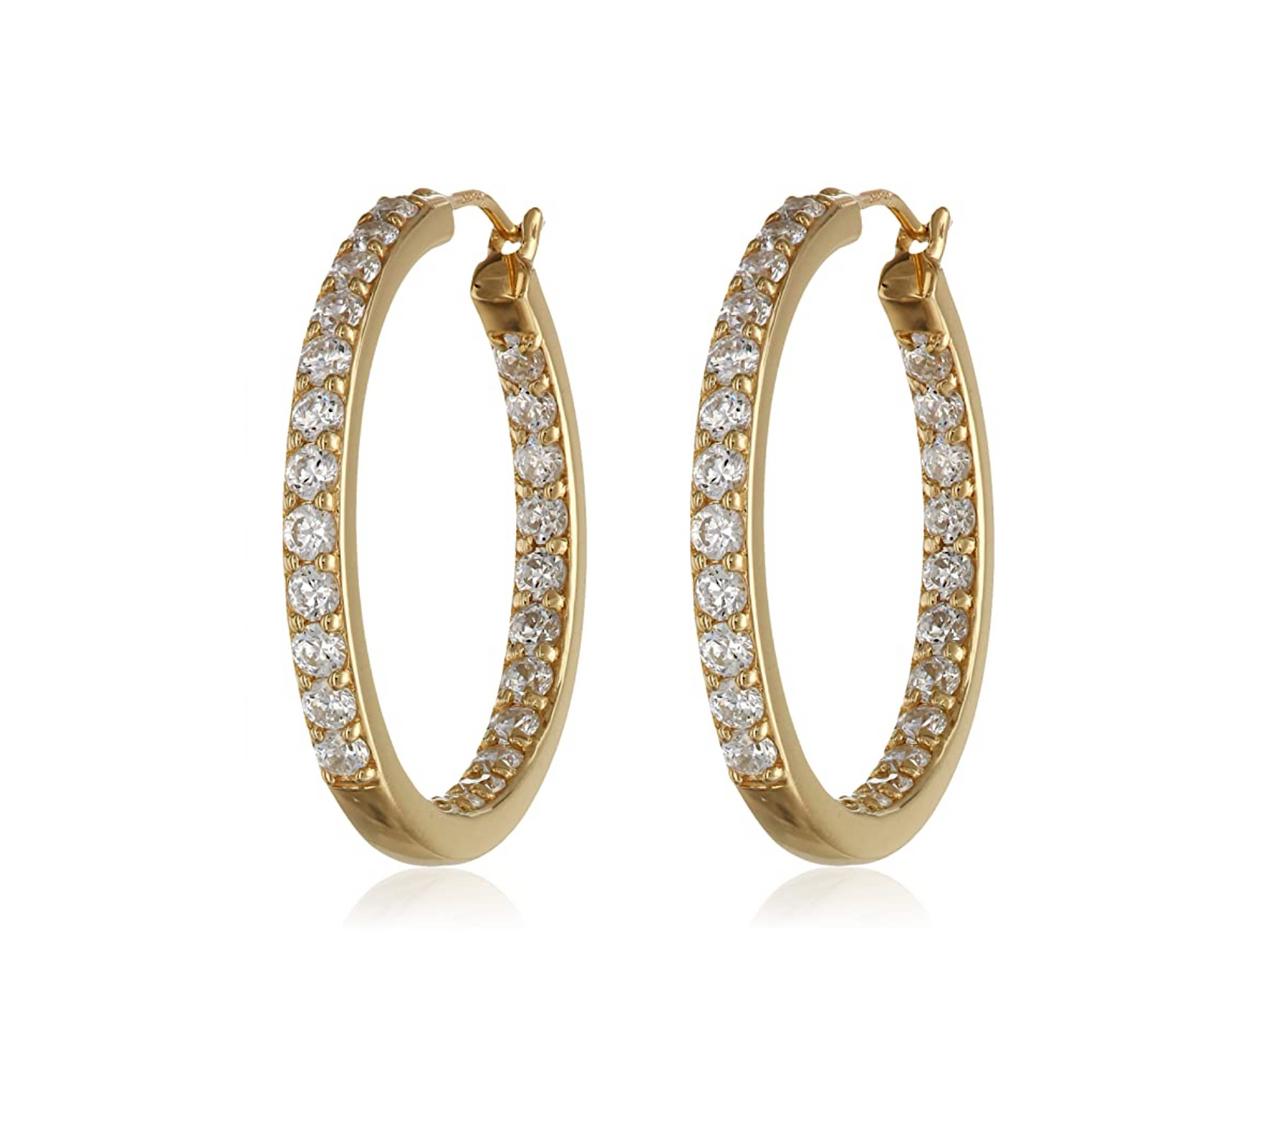 view of a pair of Goldtone & Dual Sided Clear Swarovski Crystal Everyday Hoop Earrings